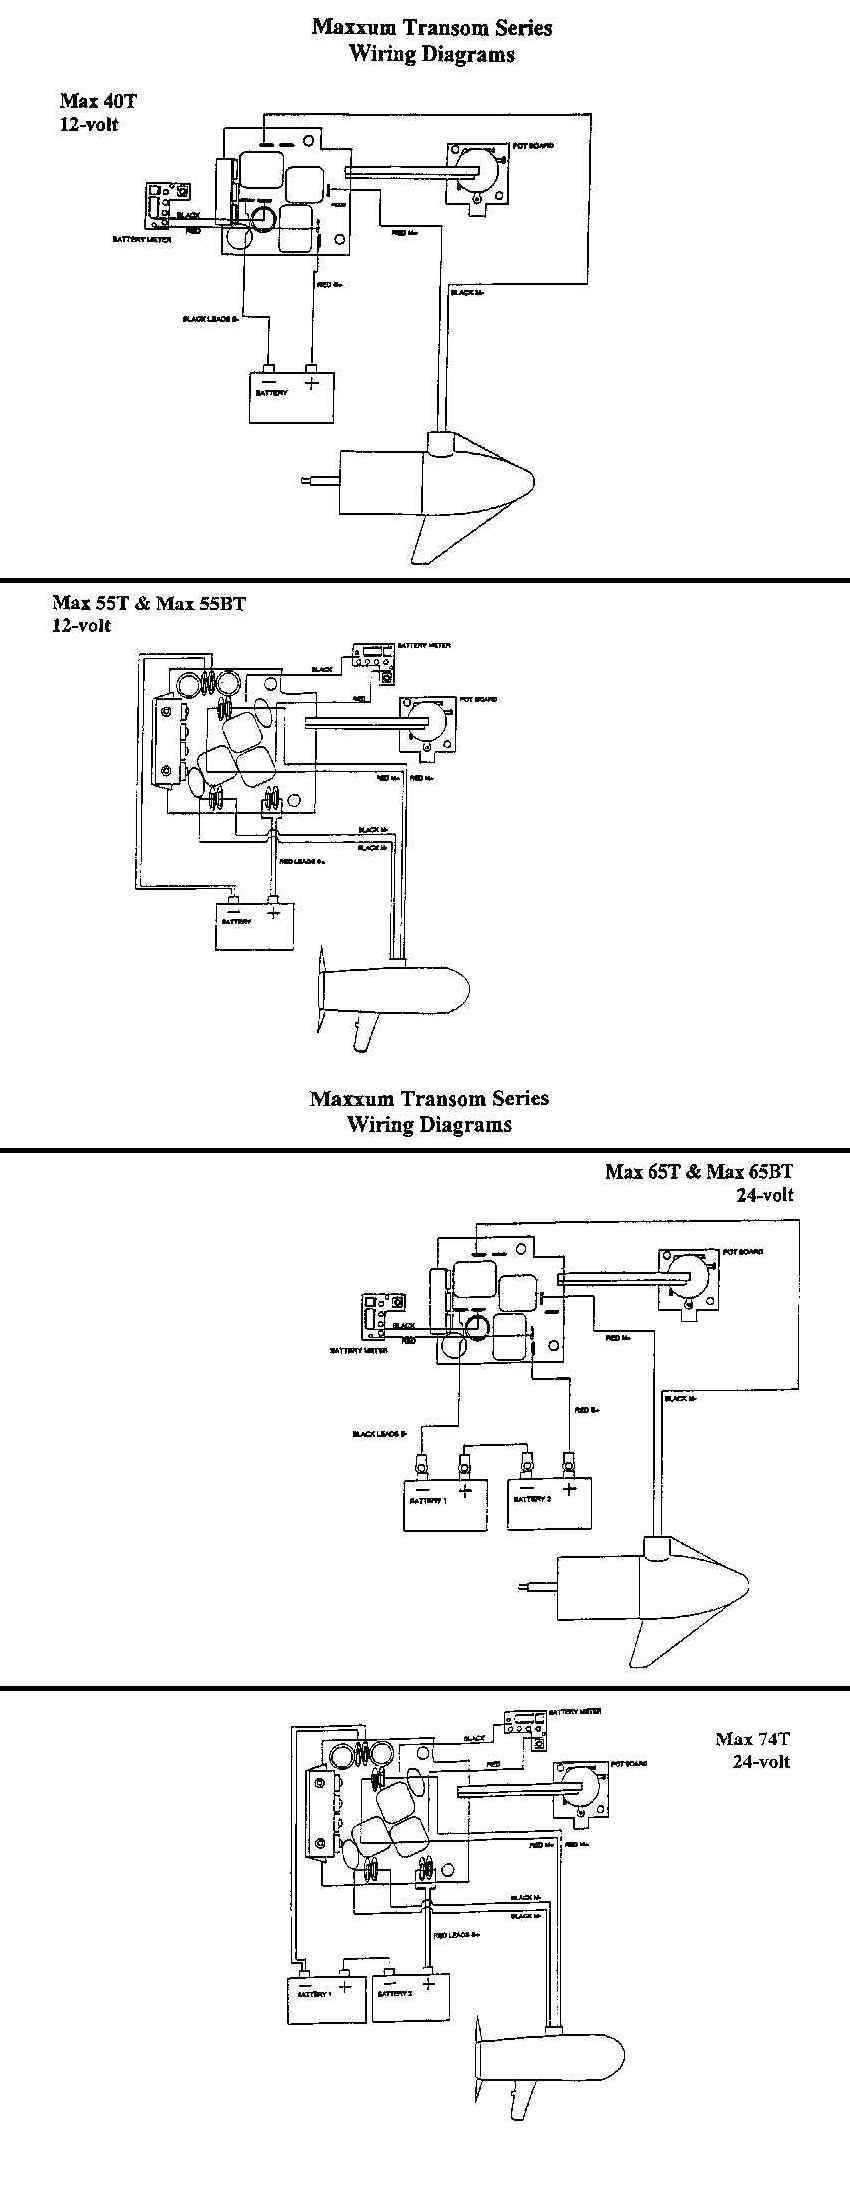 Minn Kota Power Drive V2 Wiring Diagram